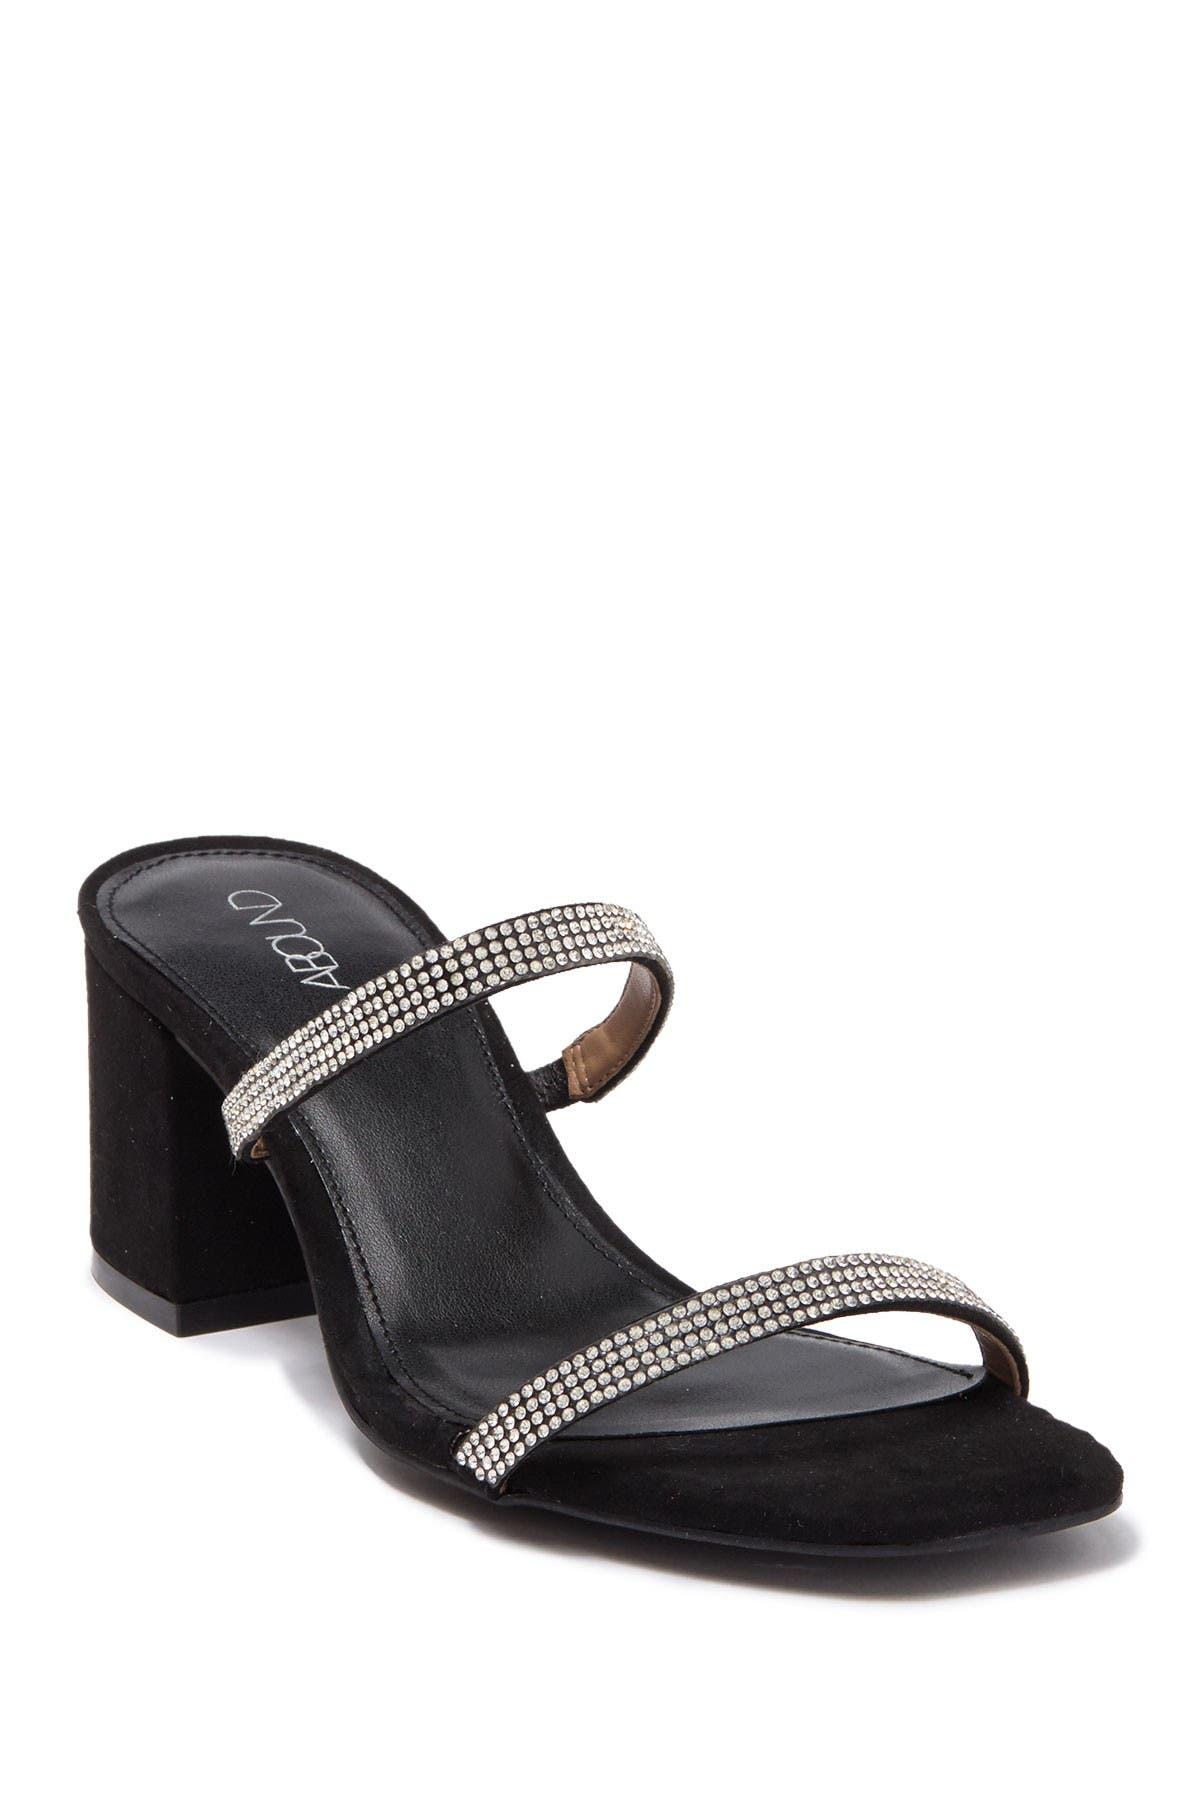 Abound | Lacey Black Heel Sandal